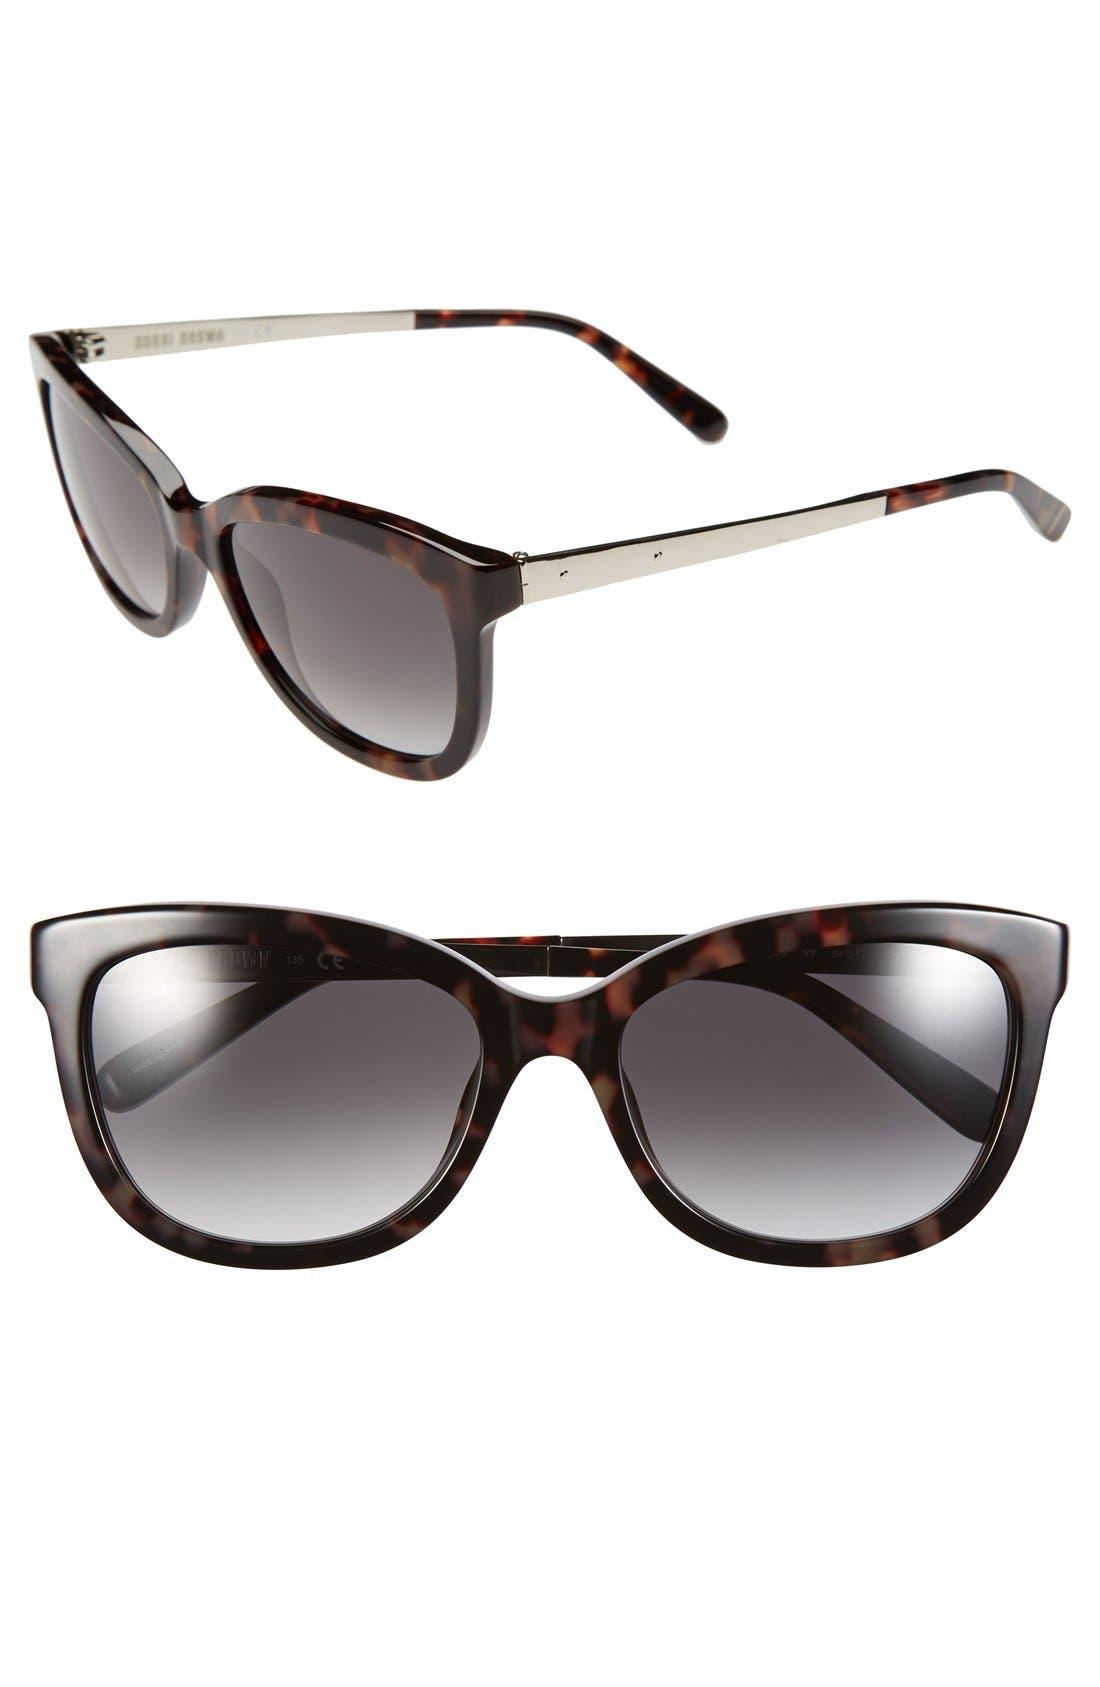 Main Image - Bobbi Brown 'The Stella' 54mm Sunglasses